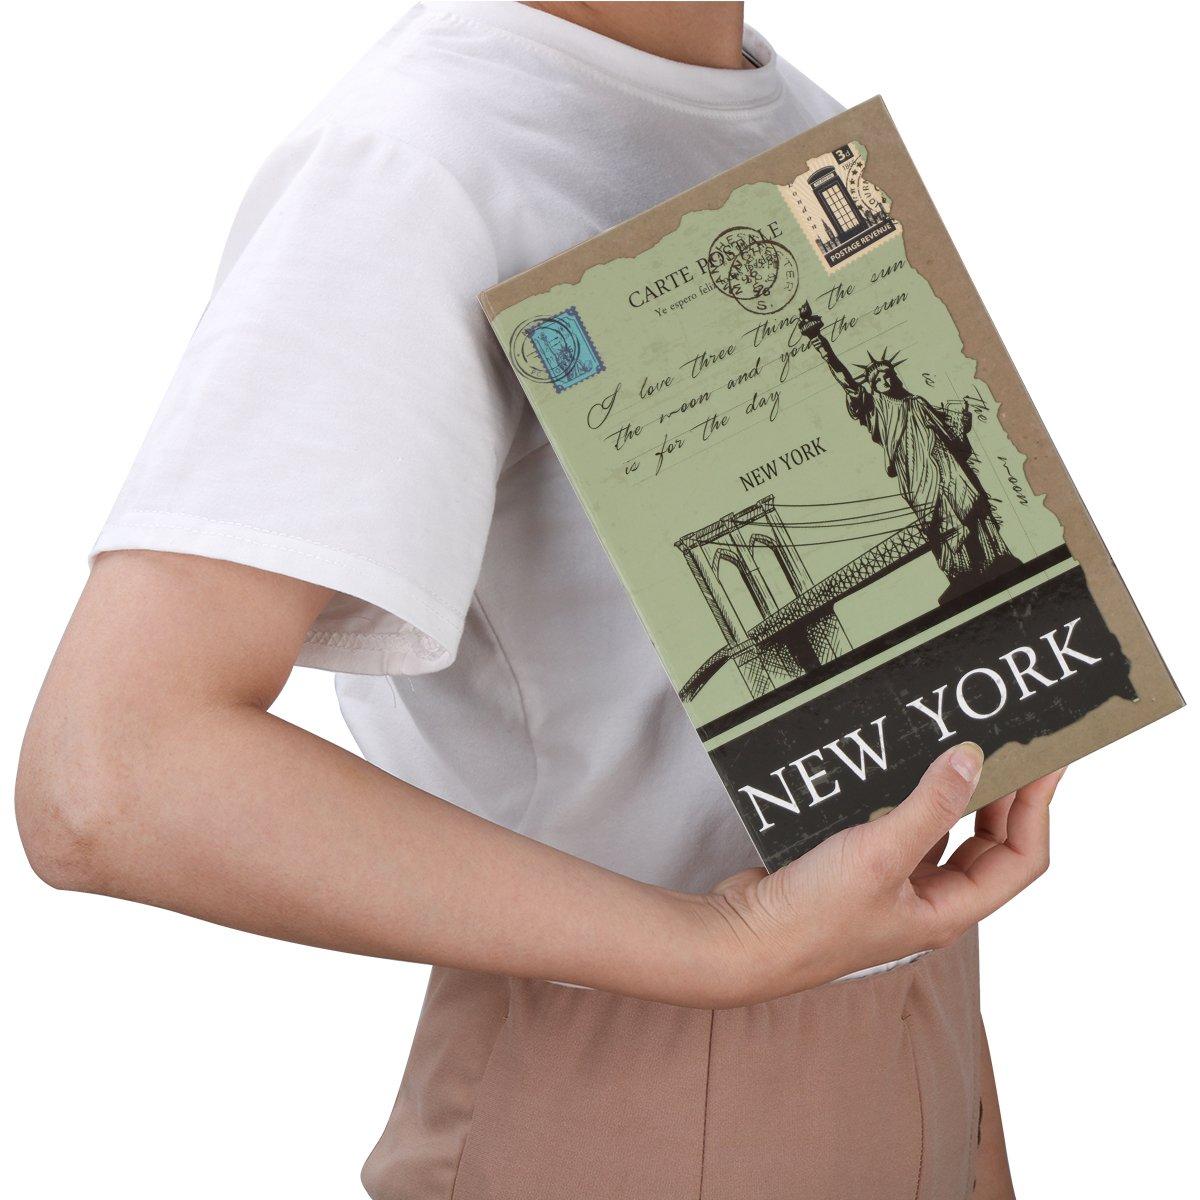 Diversion Book Safe with Combination Lock, Decaller Safe Secret Hidden Metal Lock Box, 9 1/2'' x 6'' x 1 1/3'', New York by Decaller (Image #5)